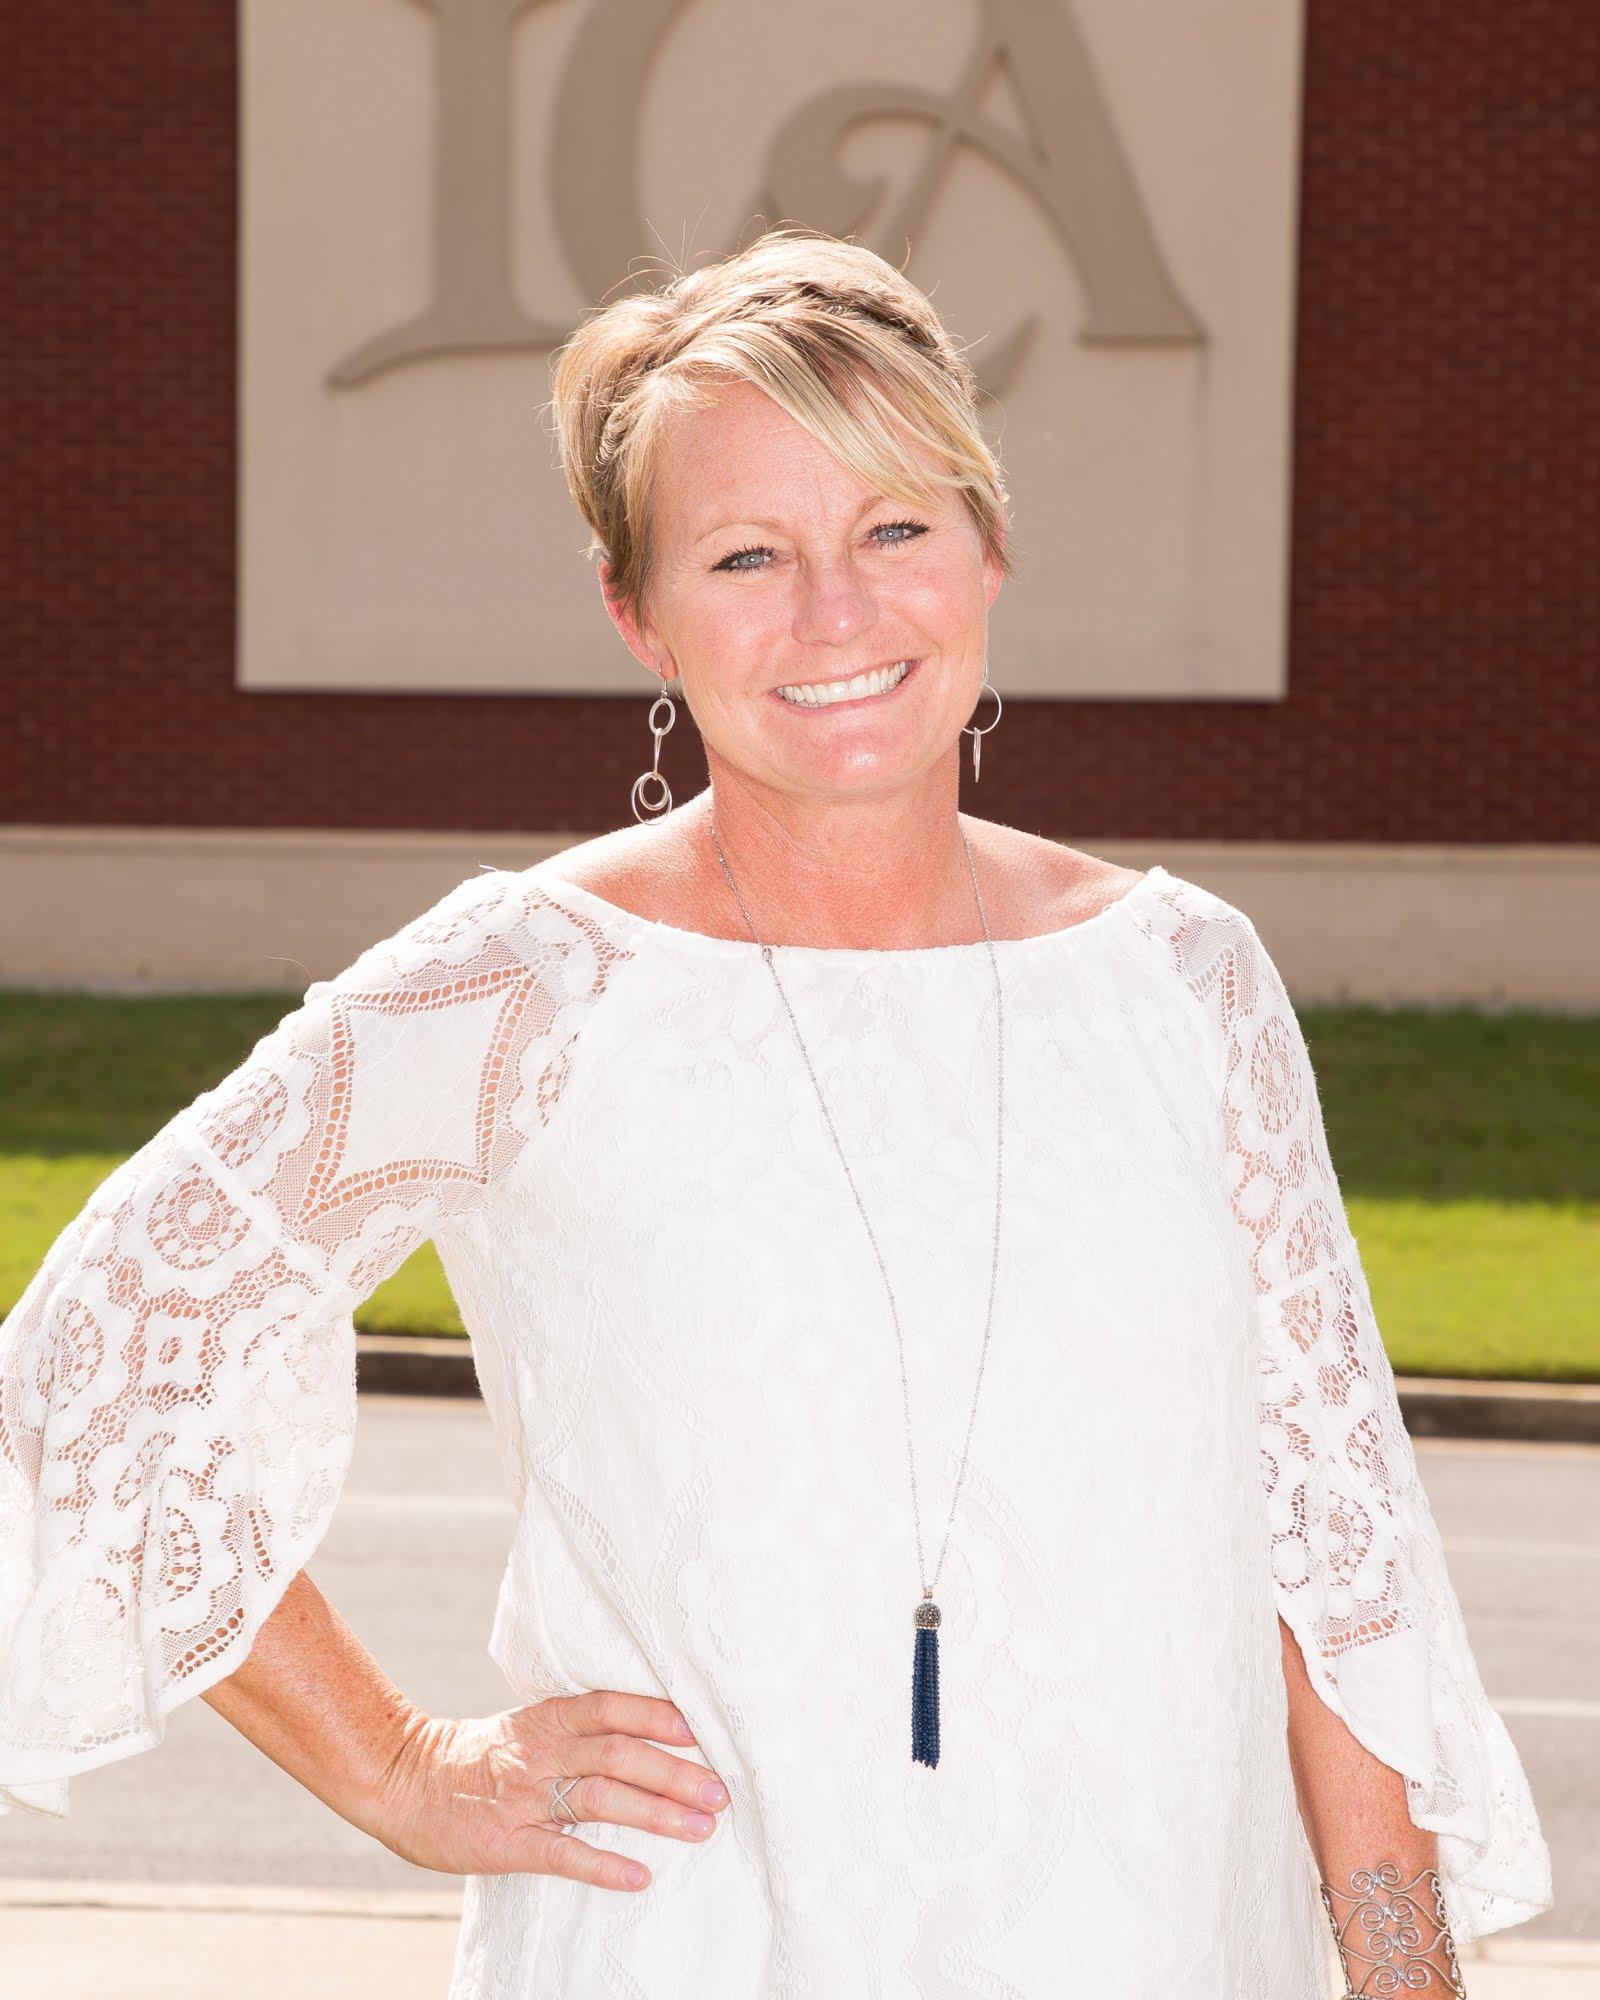 Comp Cheer Head Coach: Molly Spencer